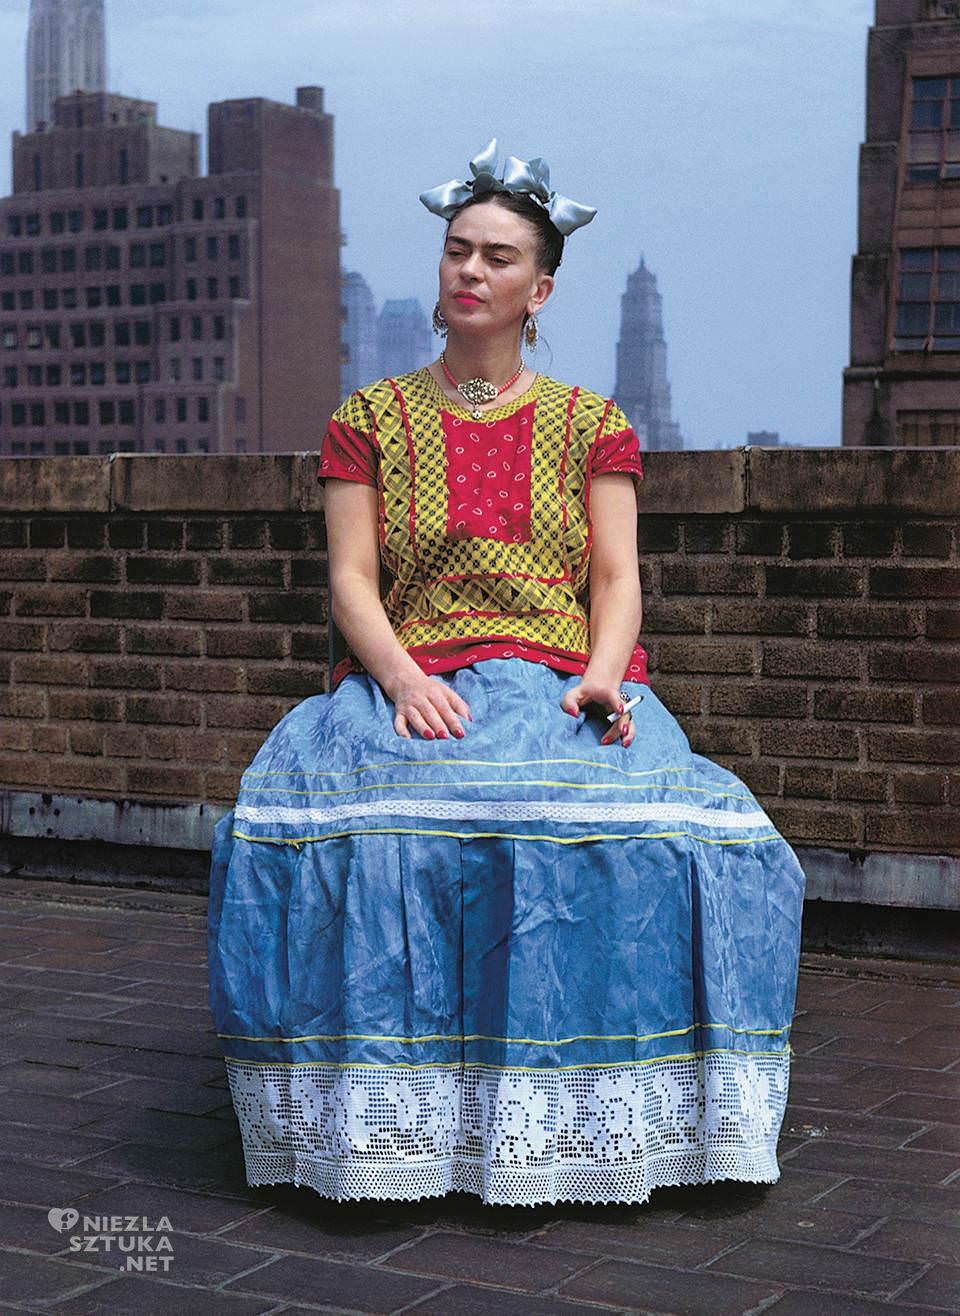 Nickolas Muray, Frida Kahlo, fotografia, kobieta, artystka, malarka, Nowy Jork, Meksyk, Niezła Sztuka